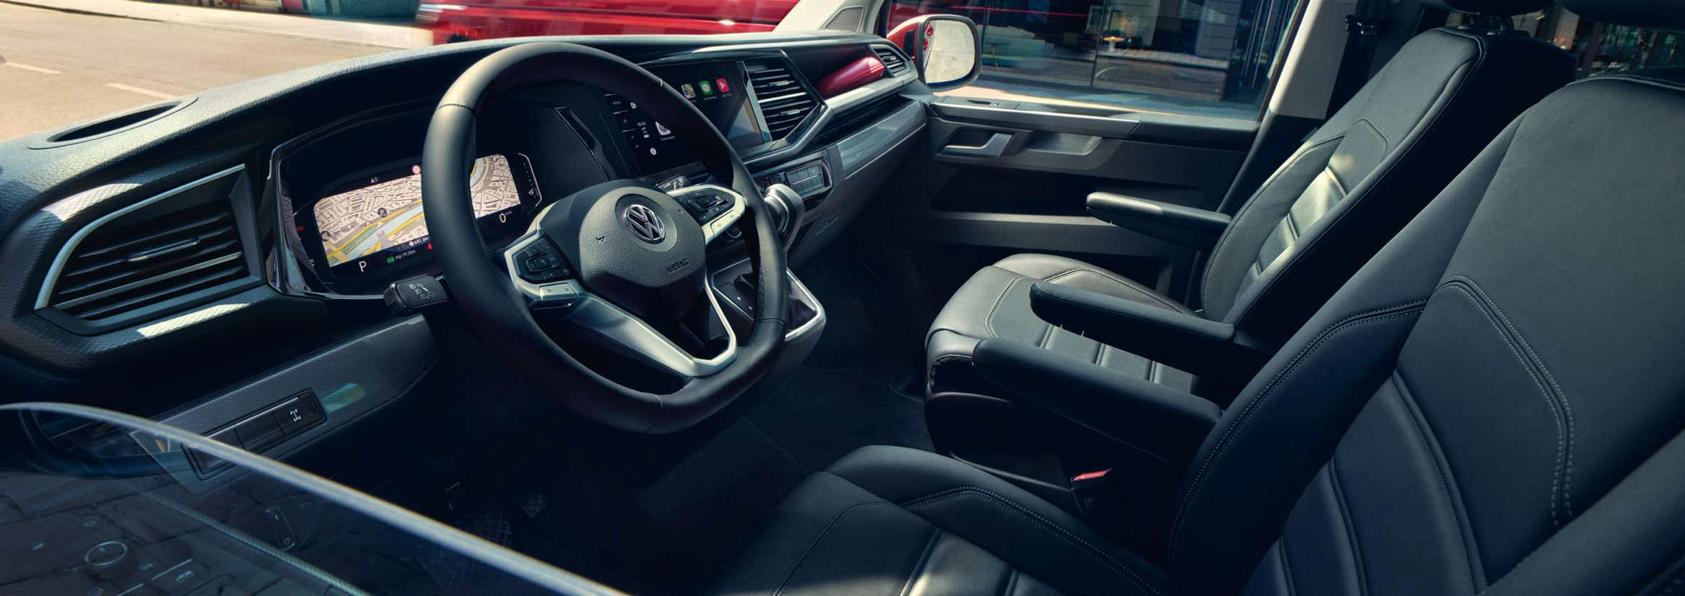 VW Multivan 6.1 Innenansicht Fahrerraum